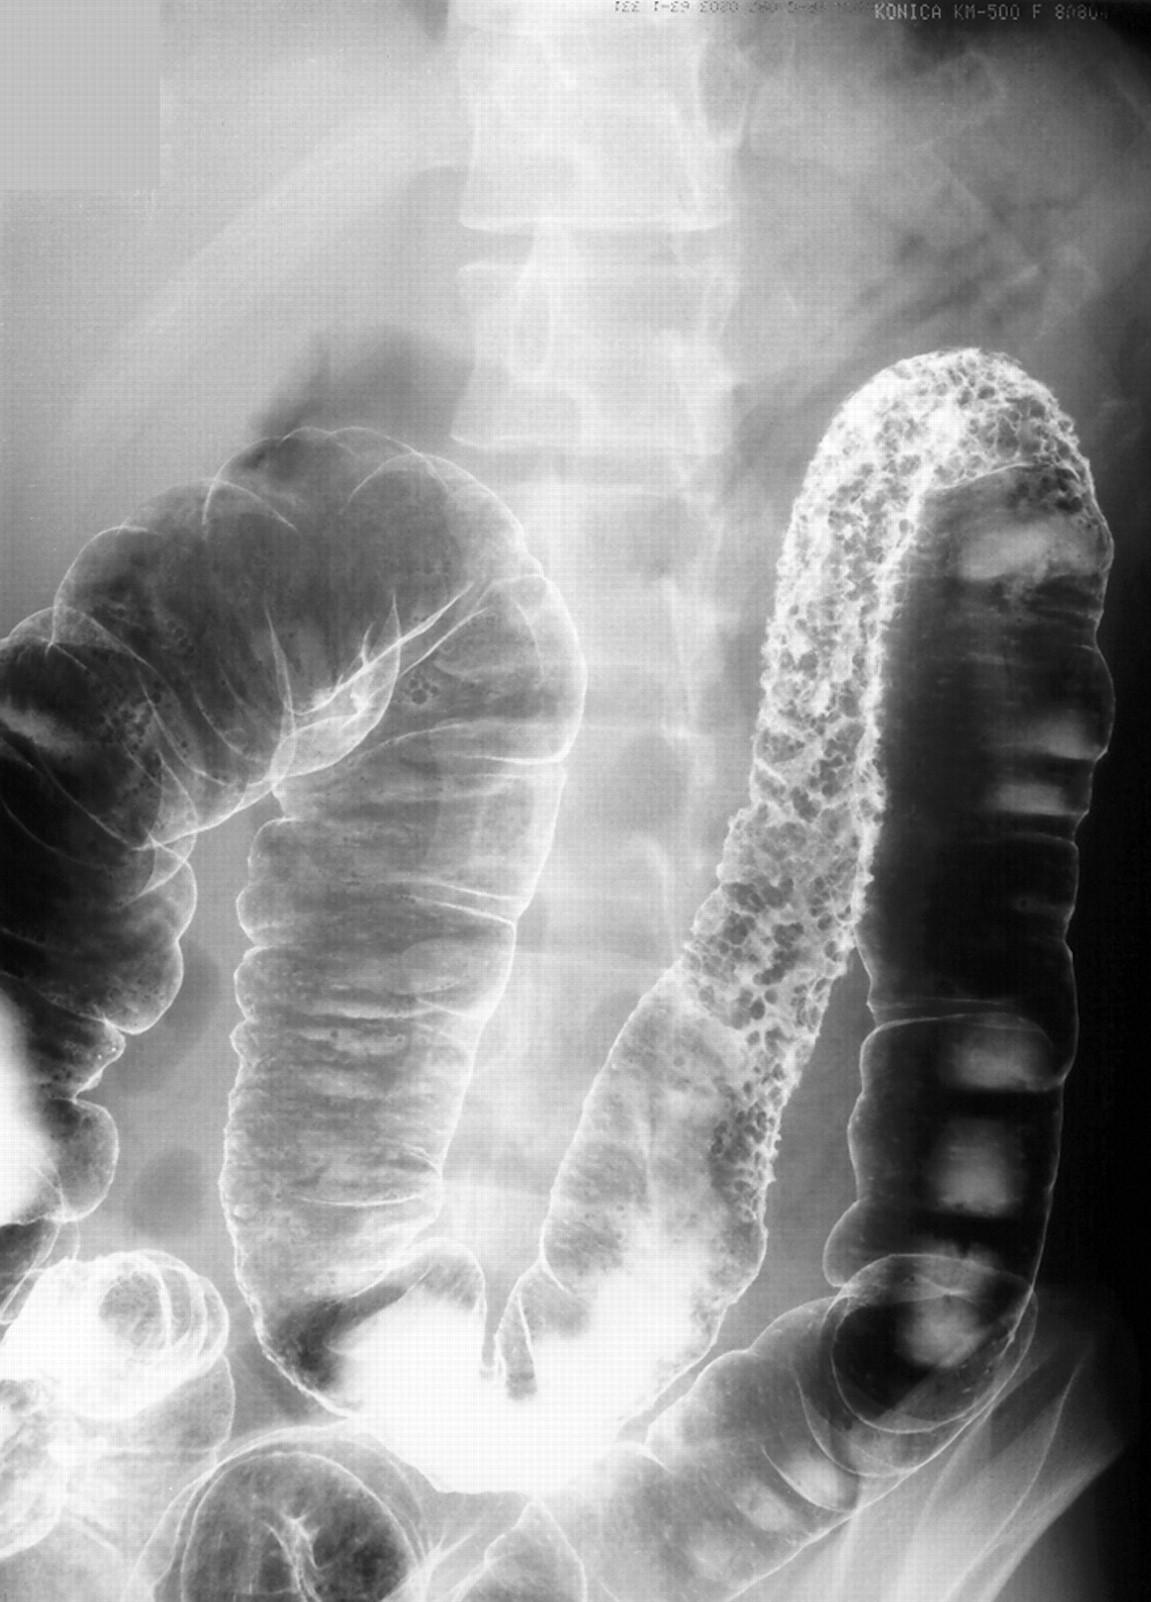 cobblestone - Humpath.com - Human pathology |Cobblestone Colon